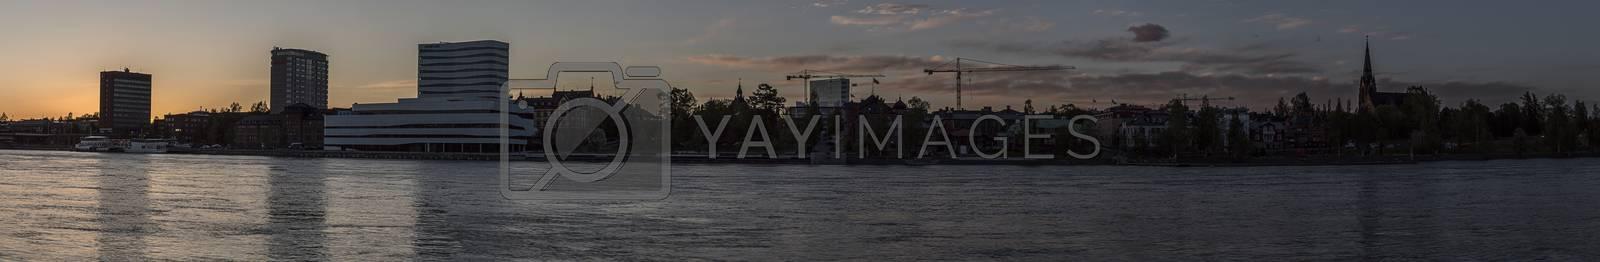 Umeå, Sweden at Sunset panorama image.